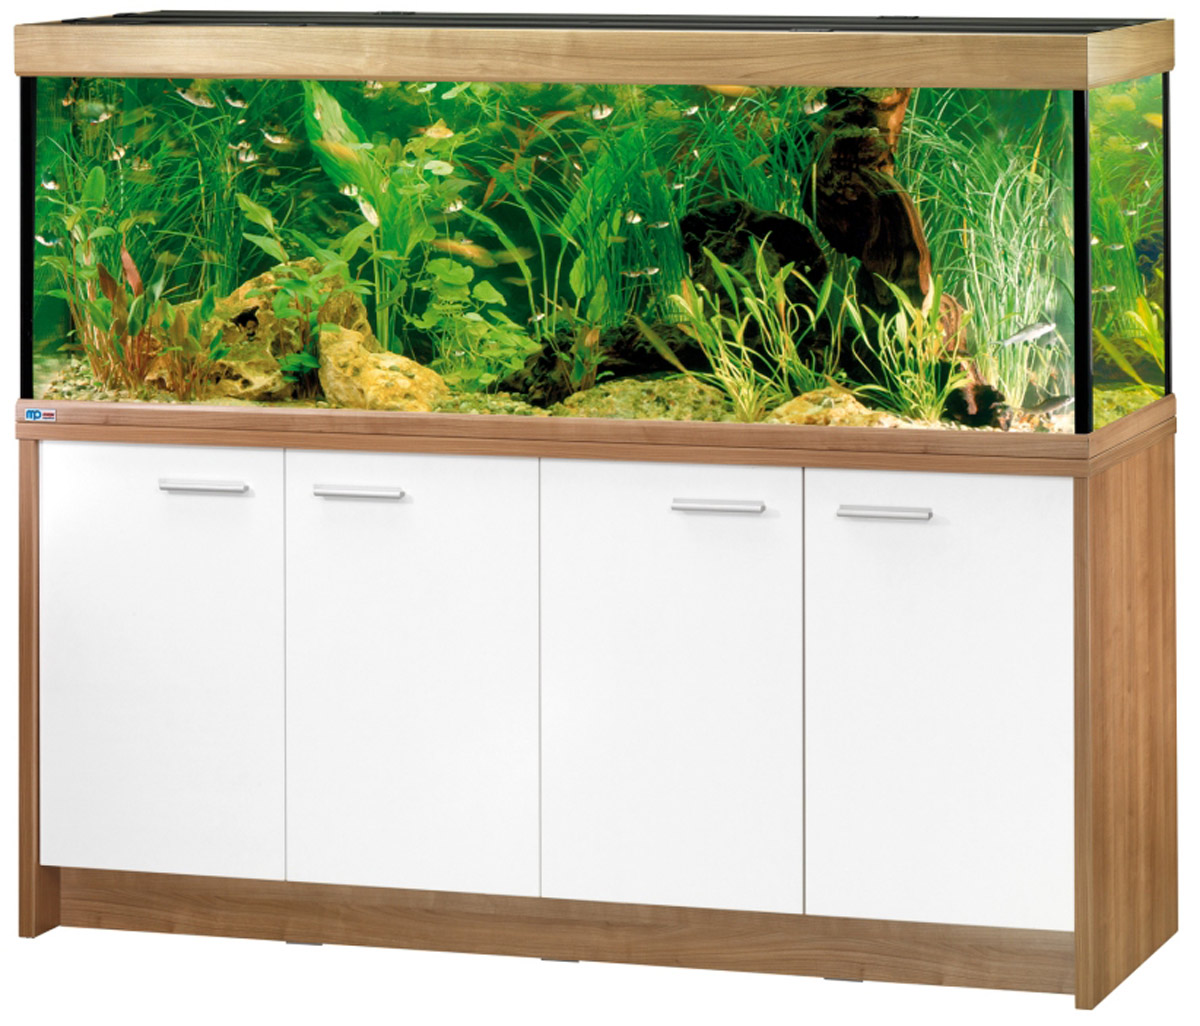 eheim scubaline 640 aquarium kombination mit unterschrank 180x60x60cm neu nuss ebay. Black Bedroom Furniture Sets. Home Design Ideas